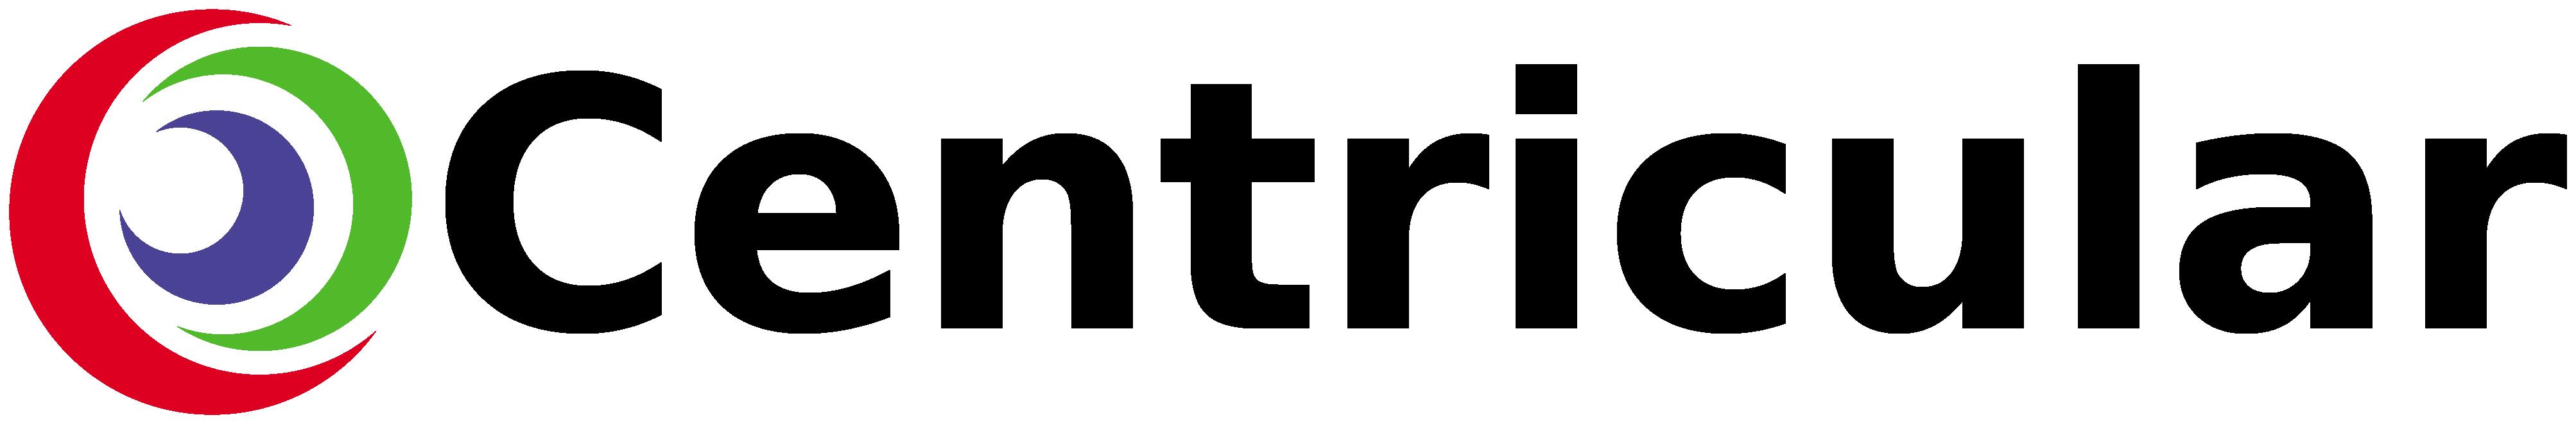 Centricular